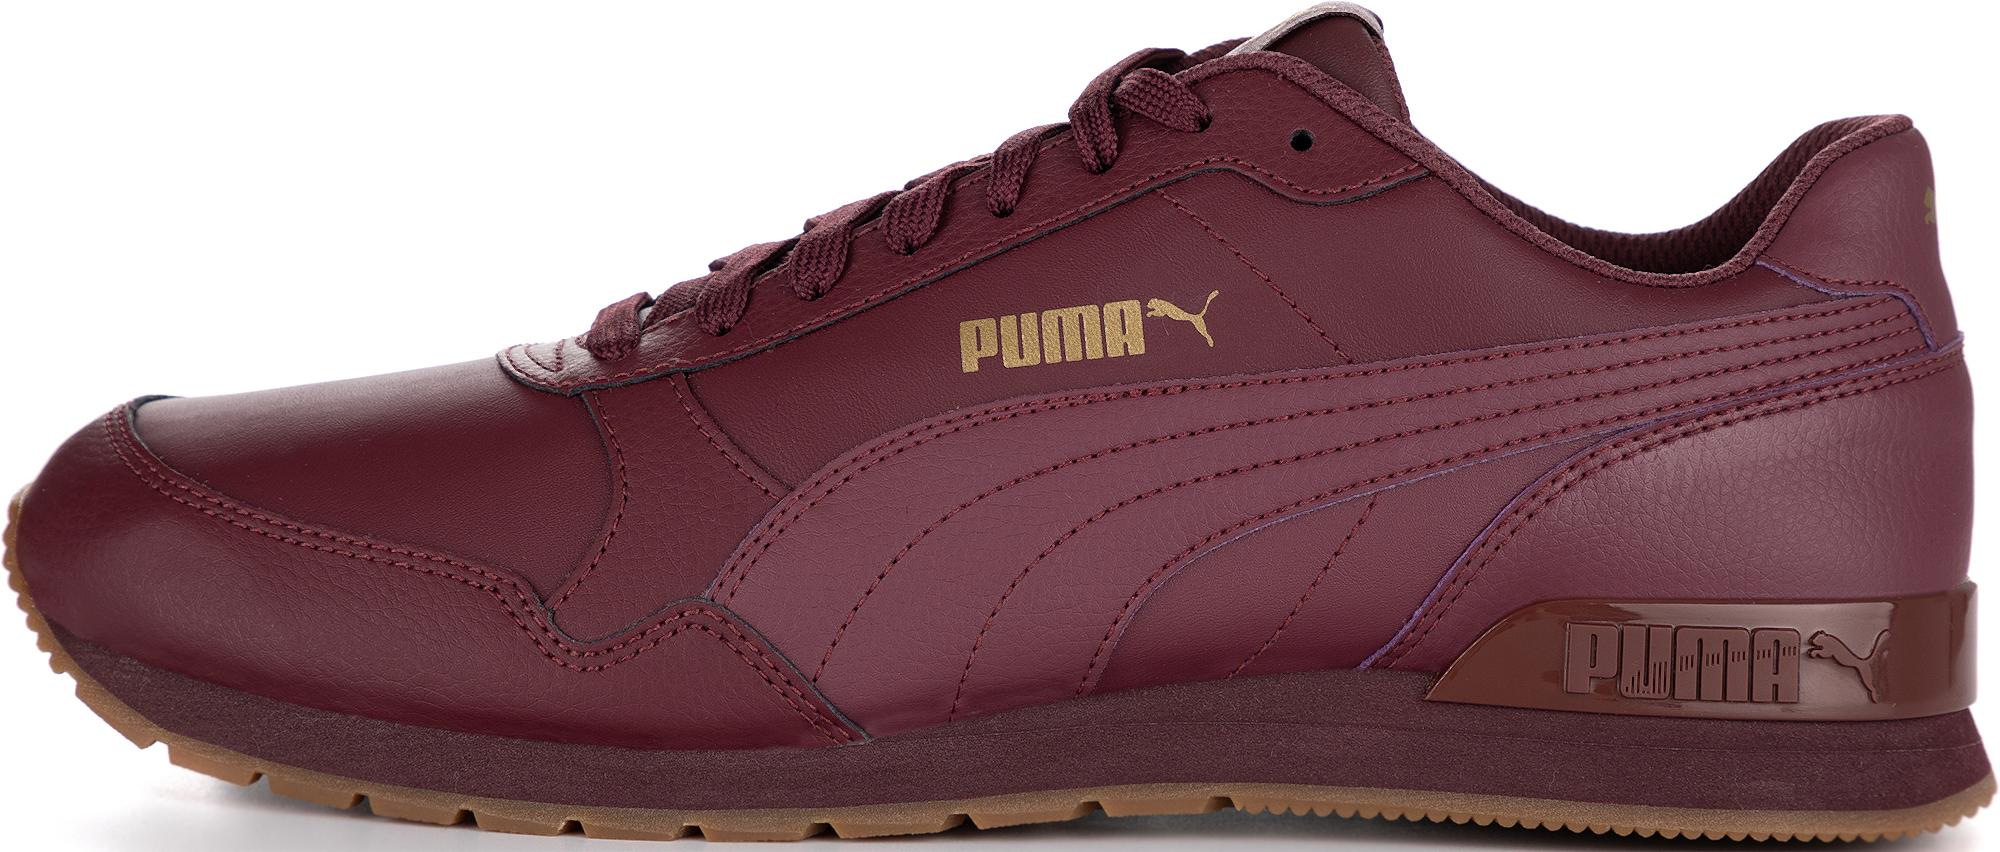 Puma Кроссовки женские Puma ST Runner v2 Full, размер 35 все цены